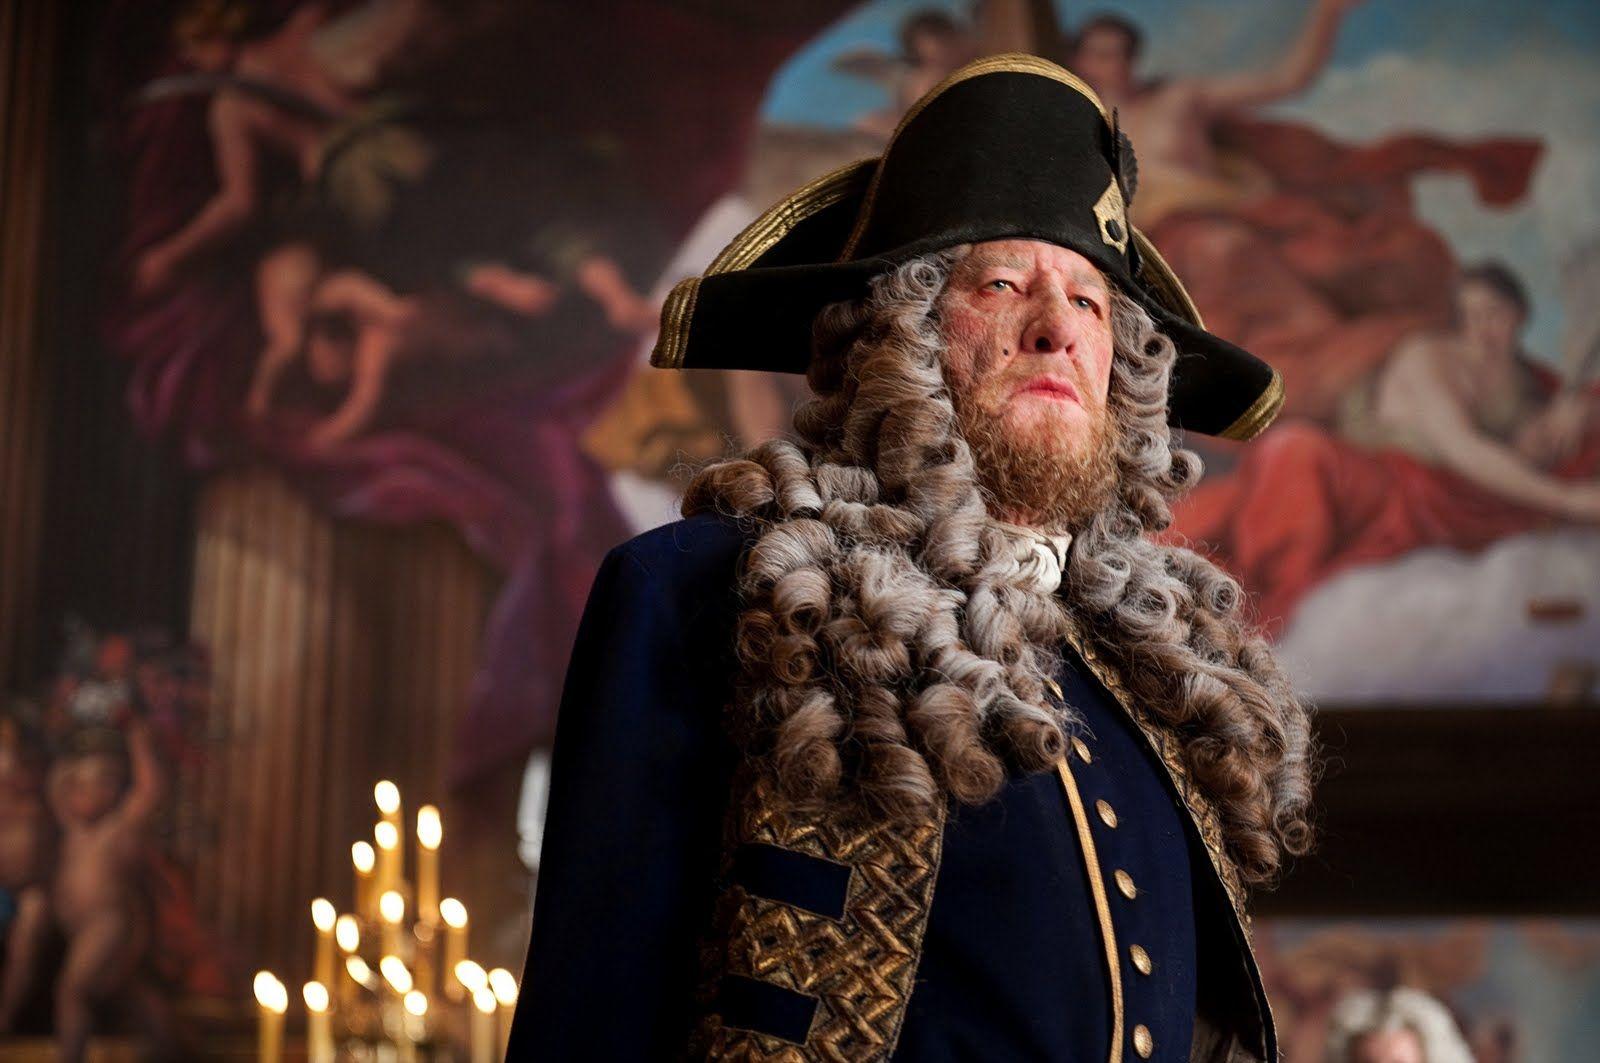 Pirates Of The Caribbean 4 Barbossa And Blackbeard Piraty Piraty Karibskogo Morya Filmy